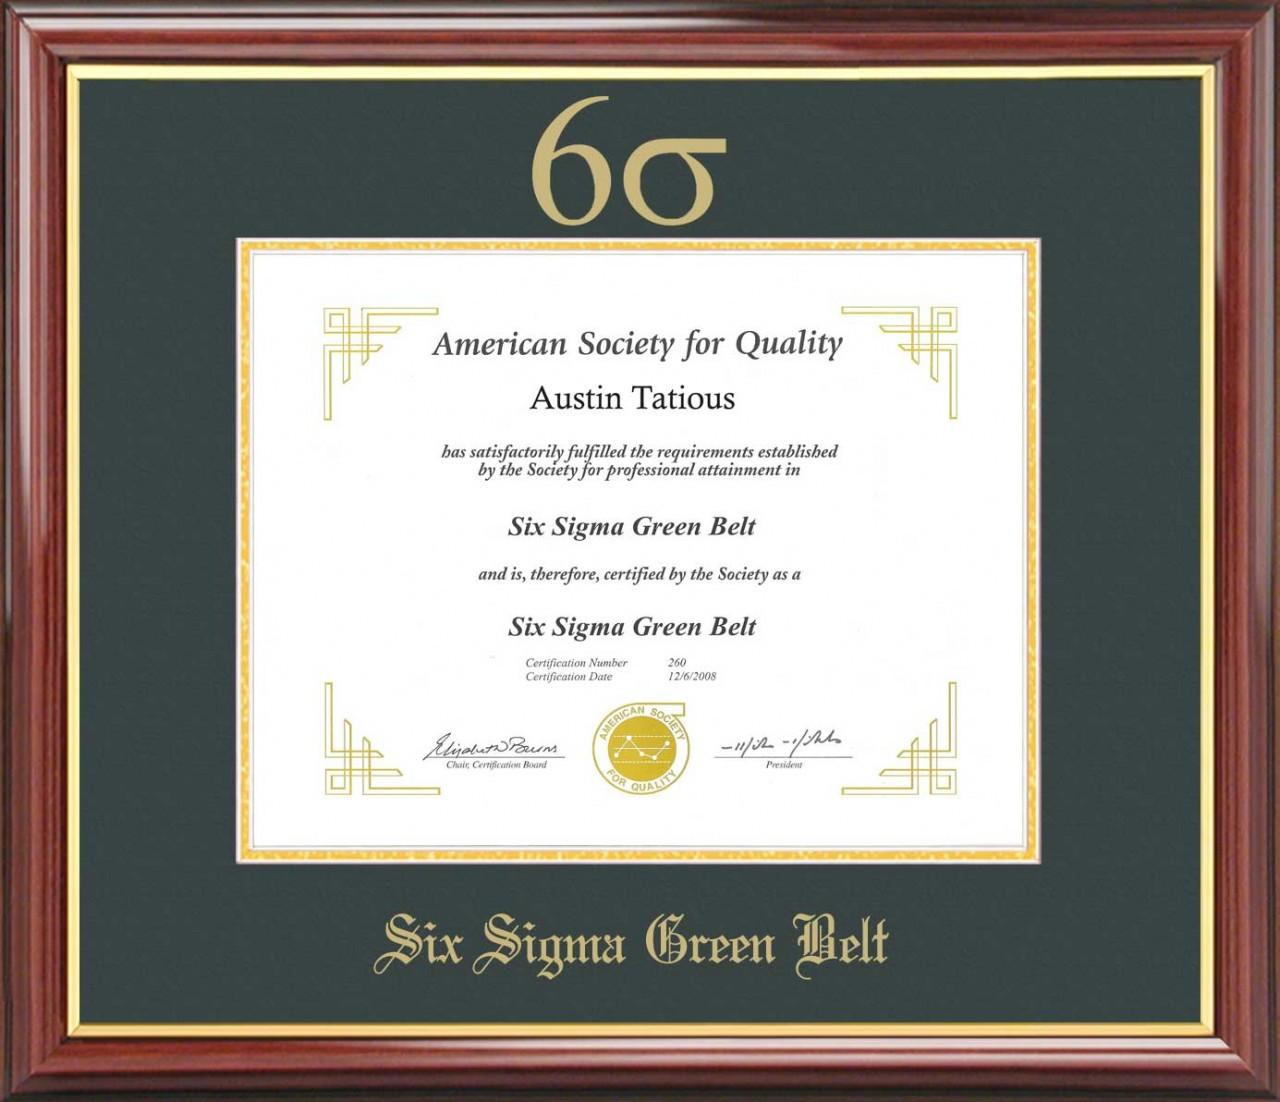 Six Sigma Green Belt Certificate Frame Mahogany With Green Mat